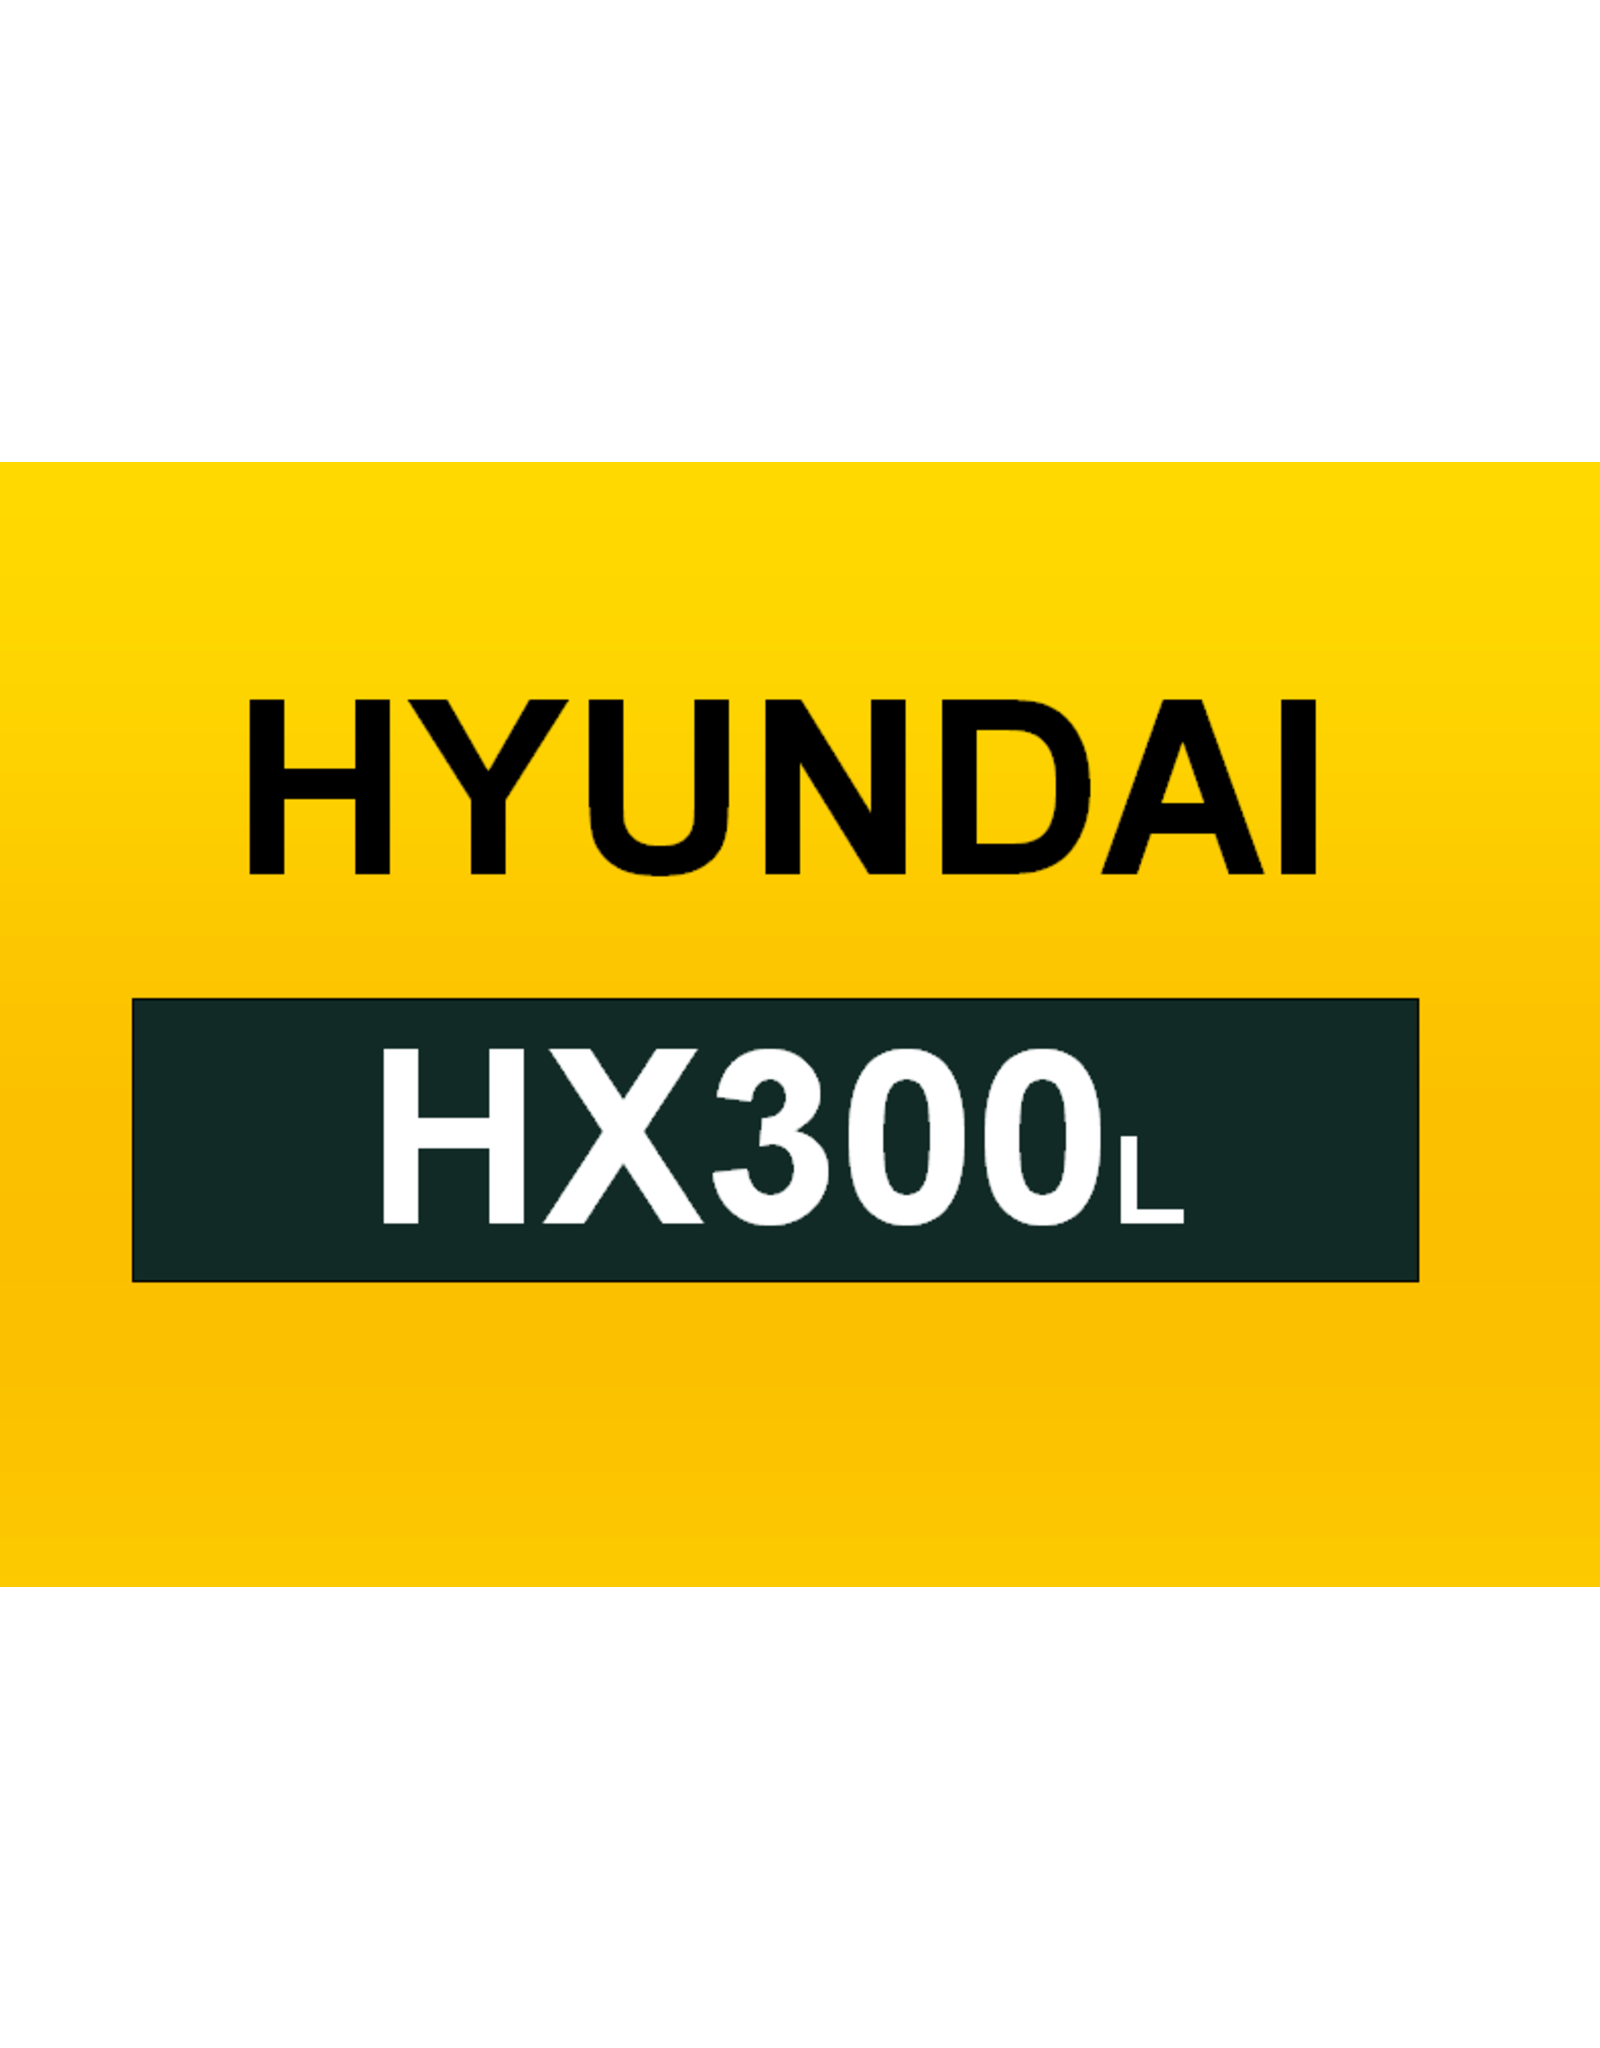 Echle Hartstahl GmbH FOPS for Hyundai HX300L